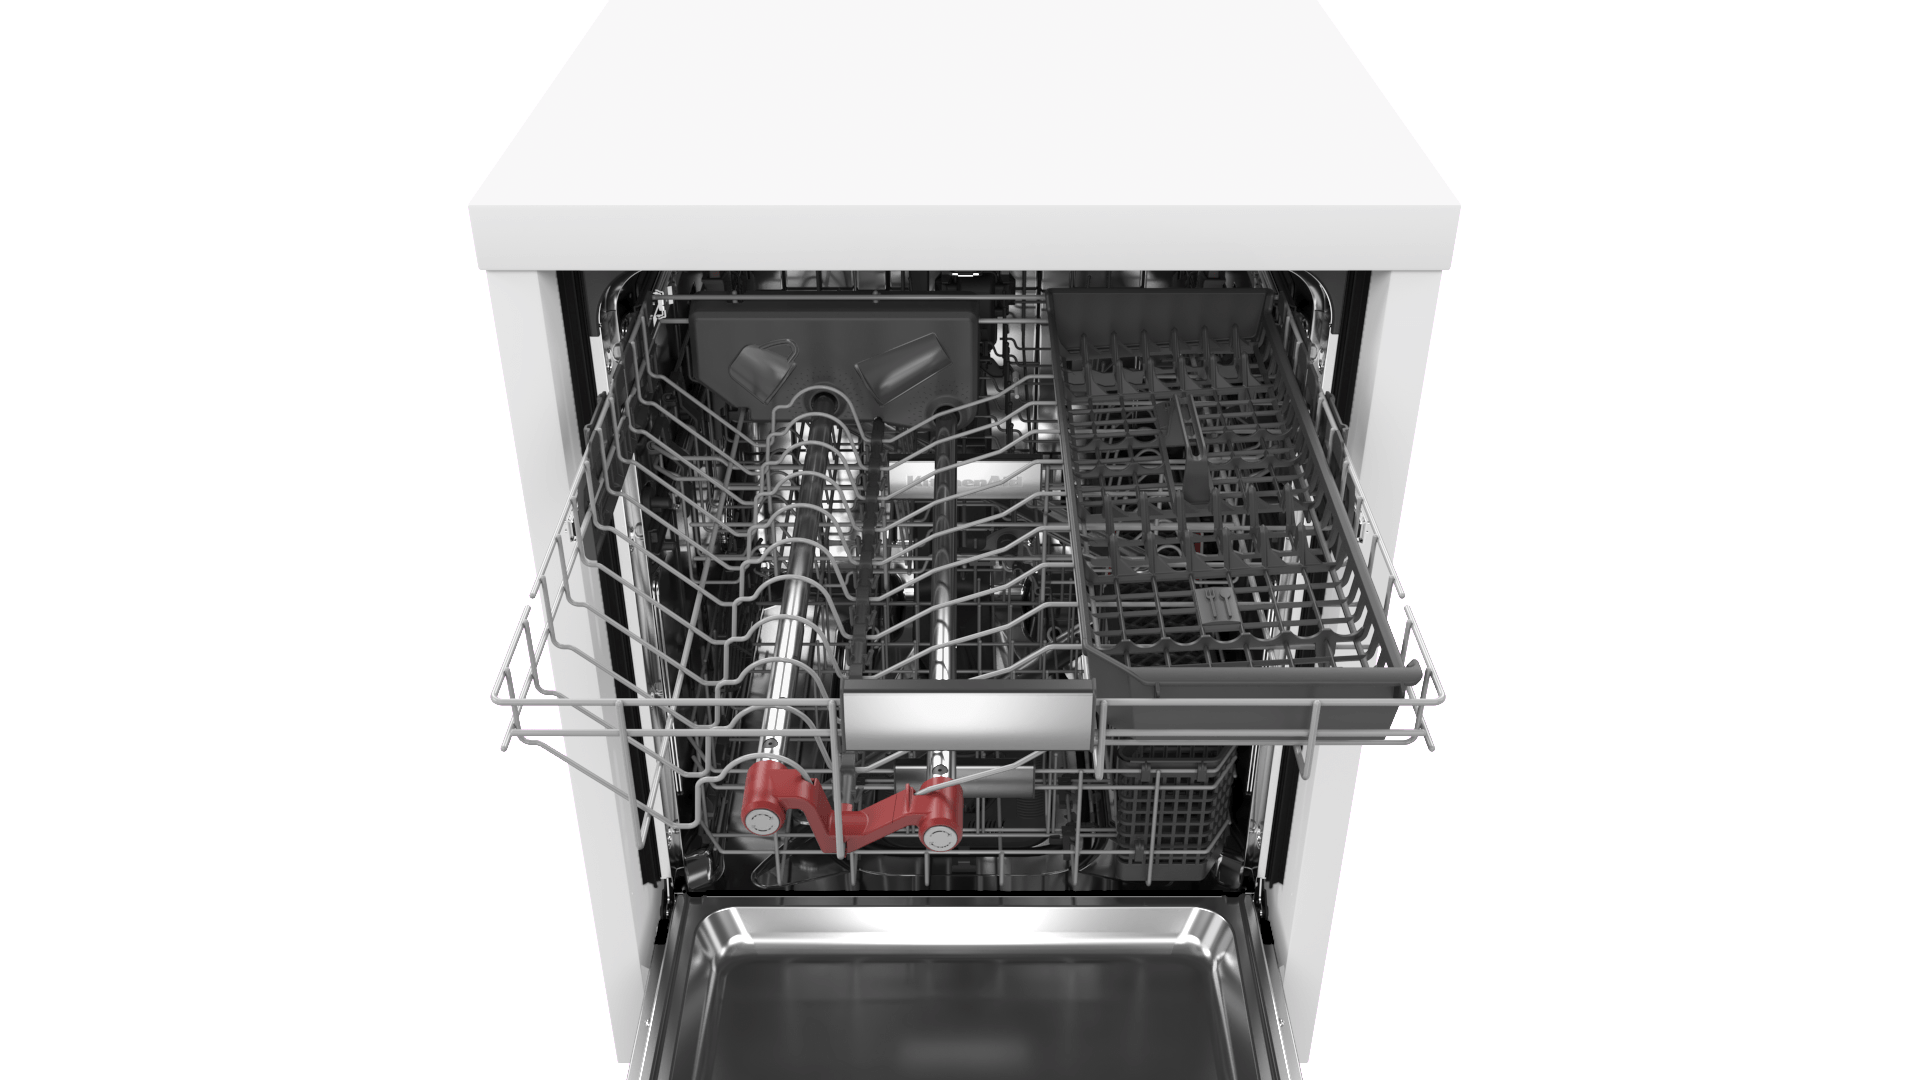 Kitchenaid Major Appliances Dishwasher Features Kitchenaid